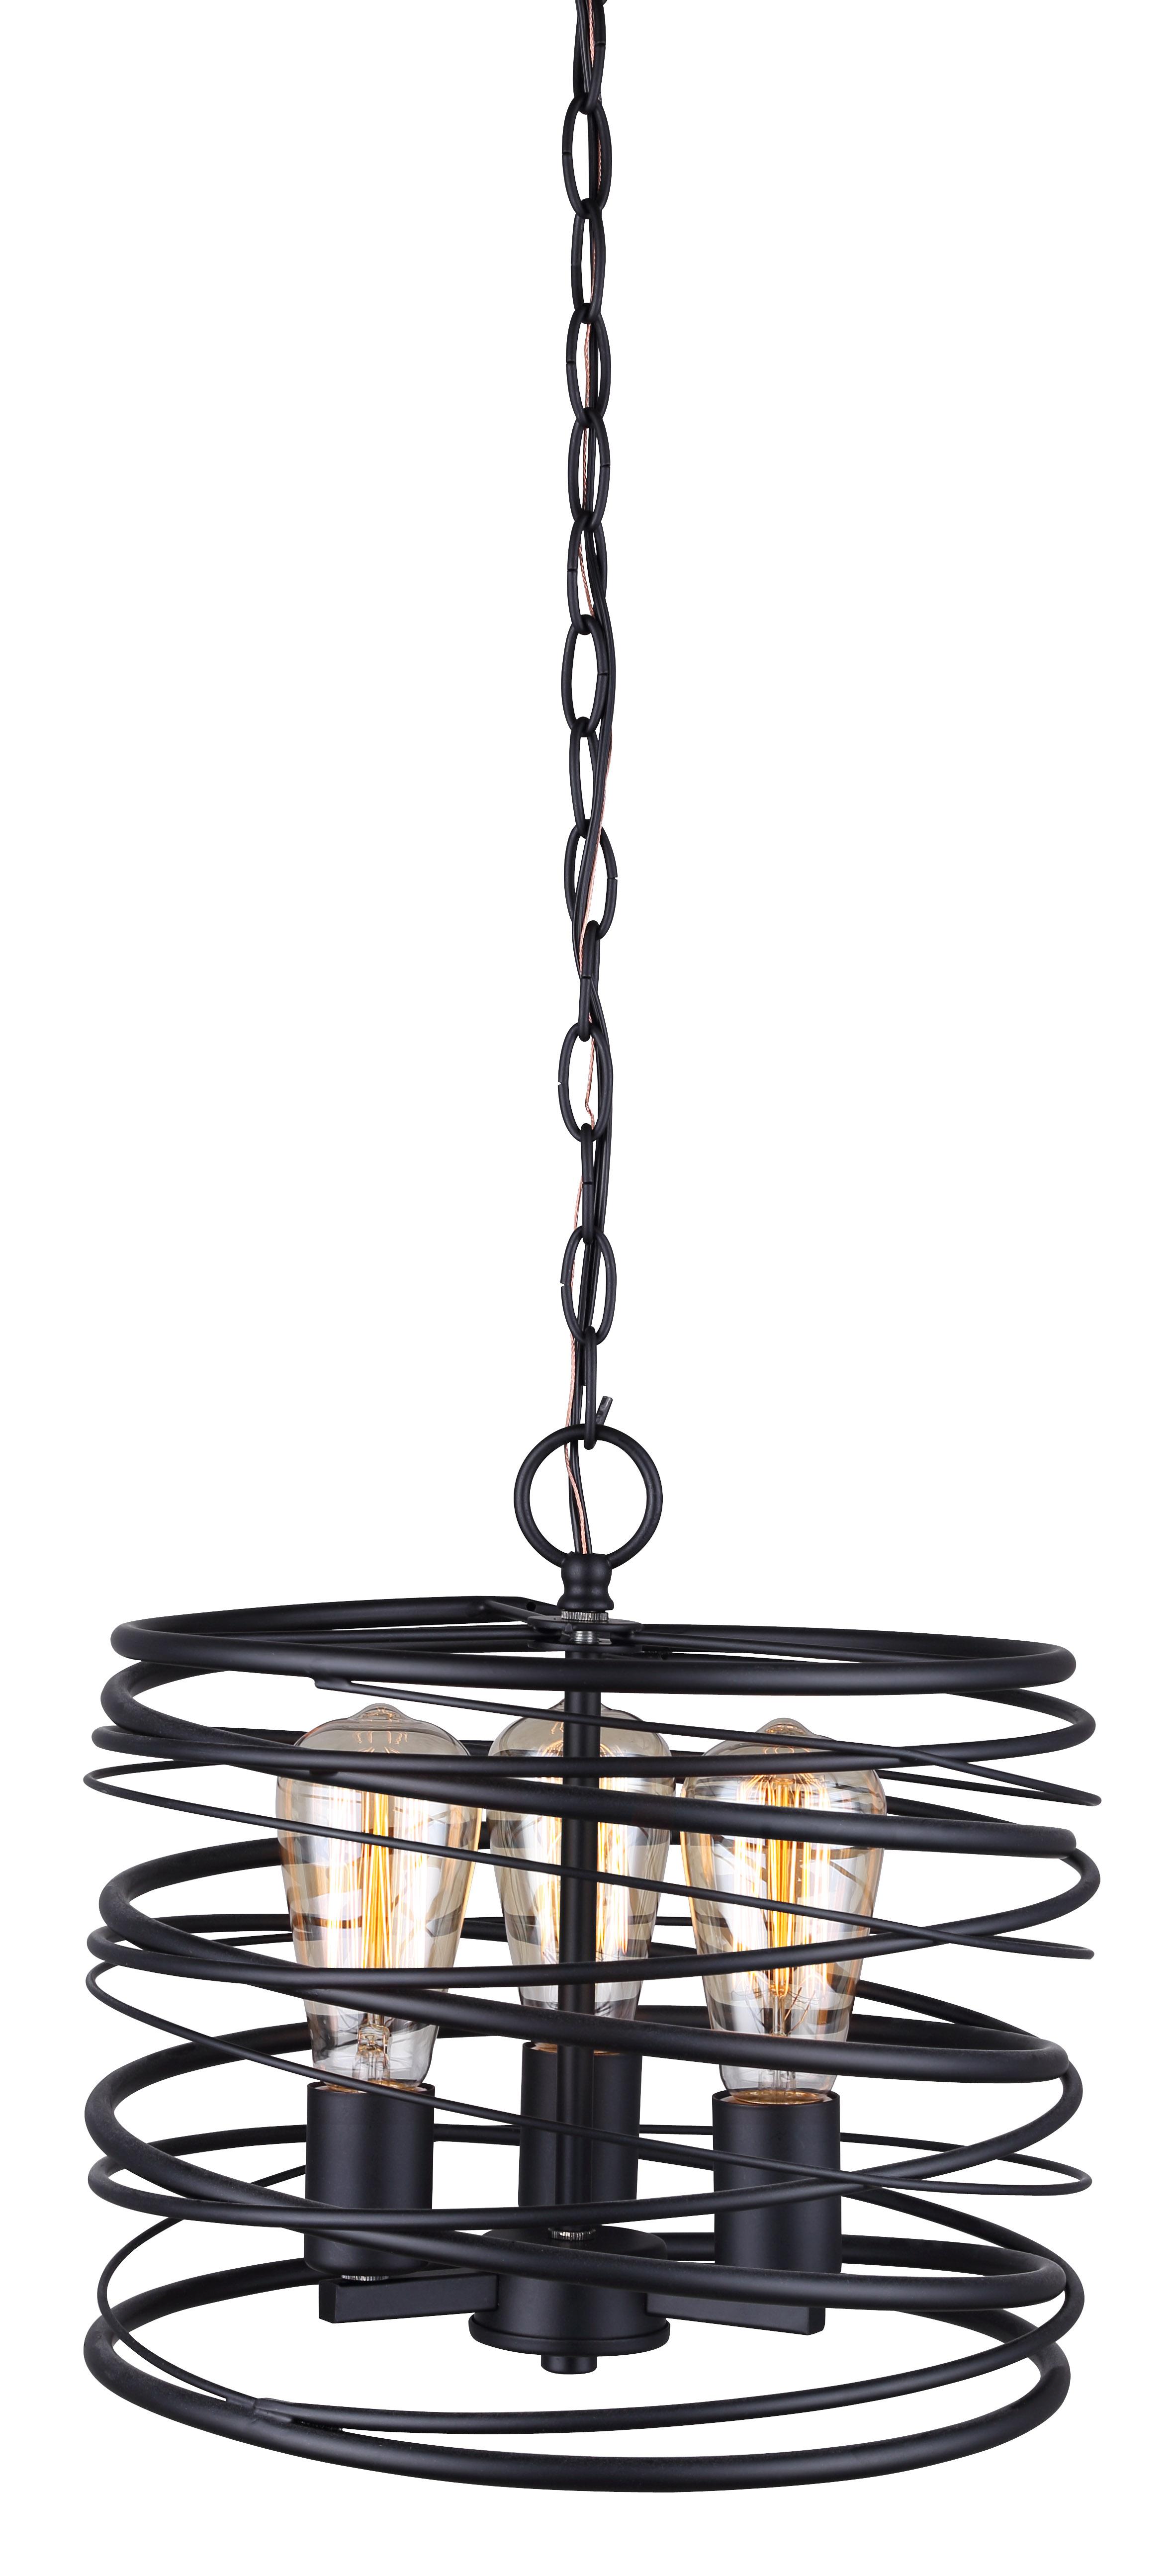 Canarm Ipl411b03bk12 Ryland 3 Light Pendant Black Light Chain 3 Light Pendant Pendant Lighting